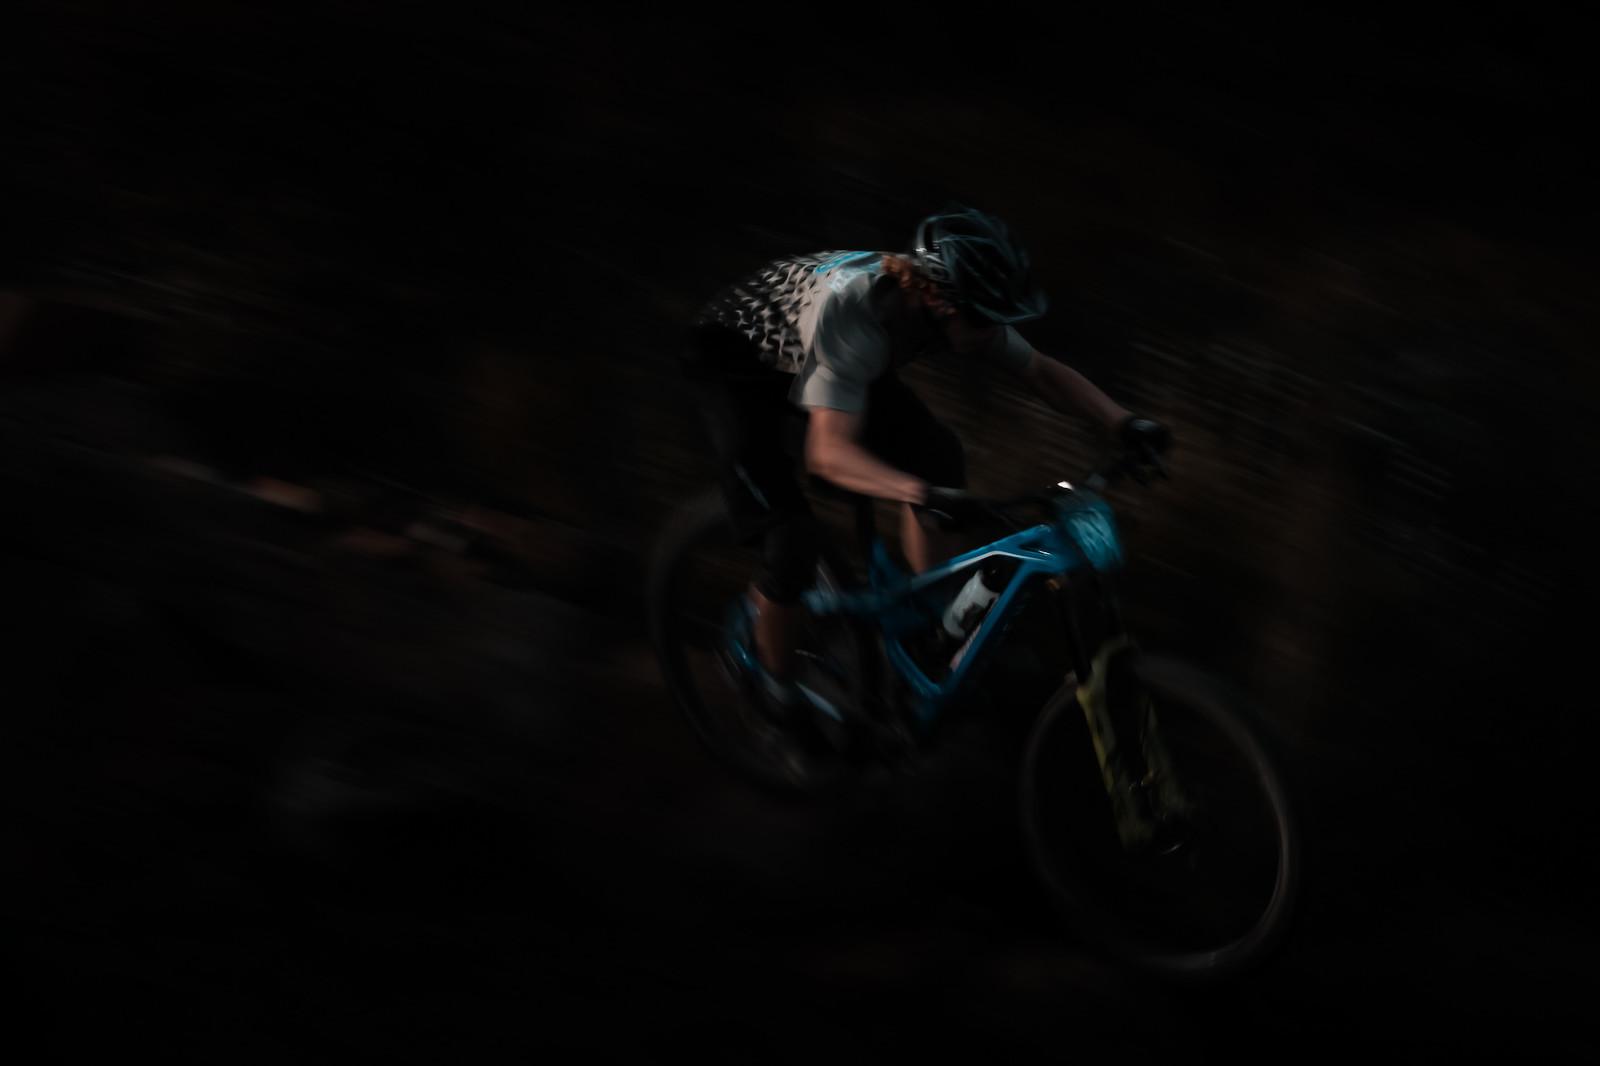 IMG 2477 - Liam Donohue - Mountain Biking Pictures - Vital MTB